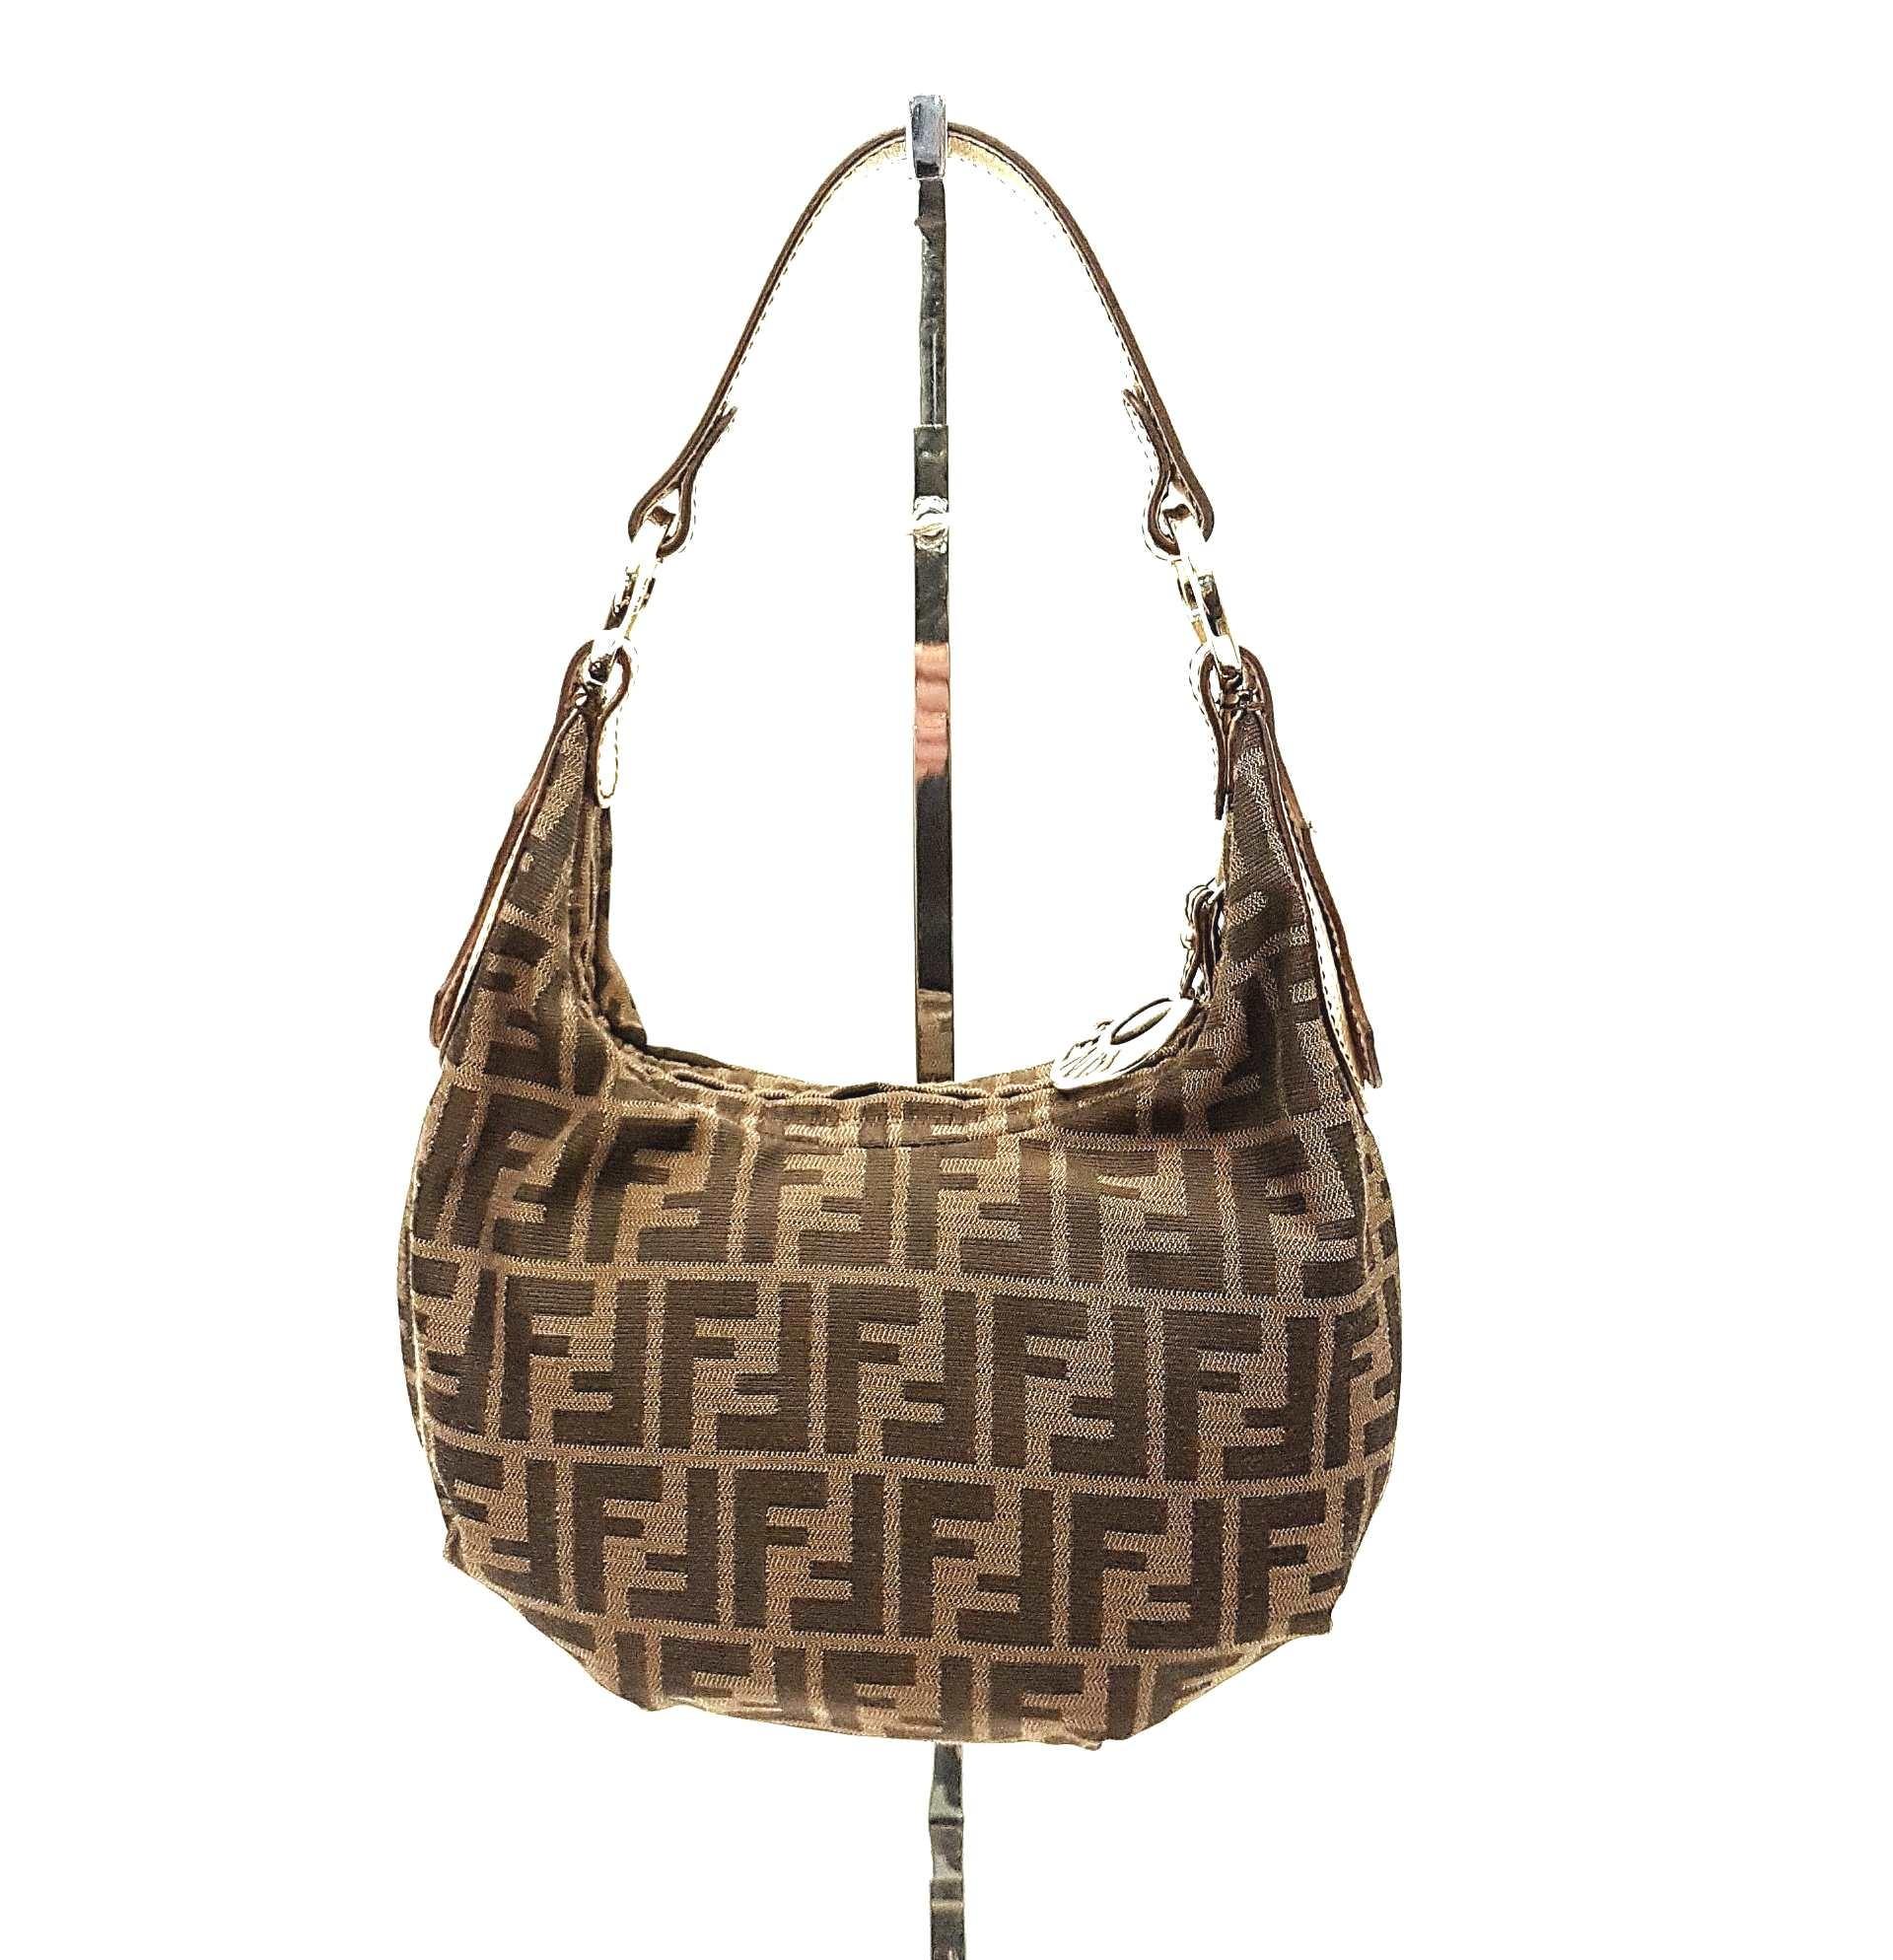 a16c8db93f4f ... ireland fendi hobo bags luxury womens clothing rome shop luxury fashion  bags dd7bc f30e1